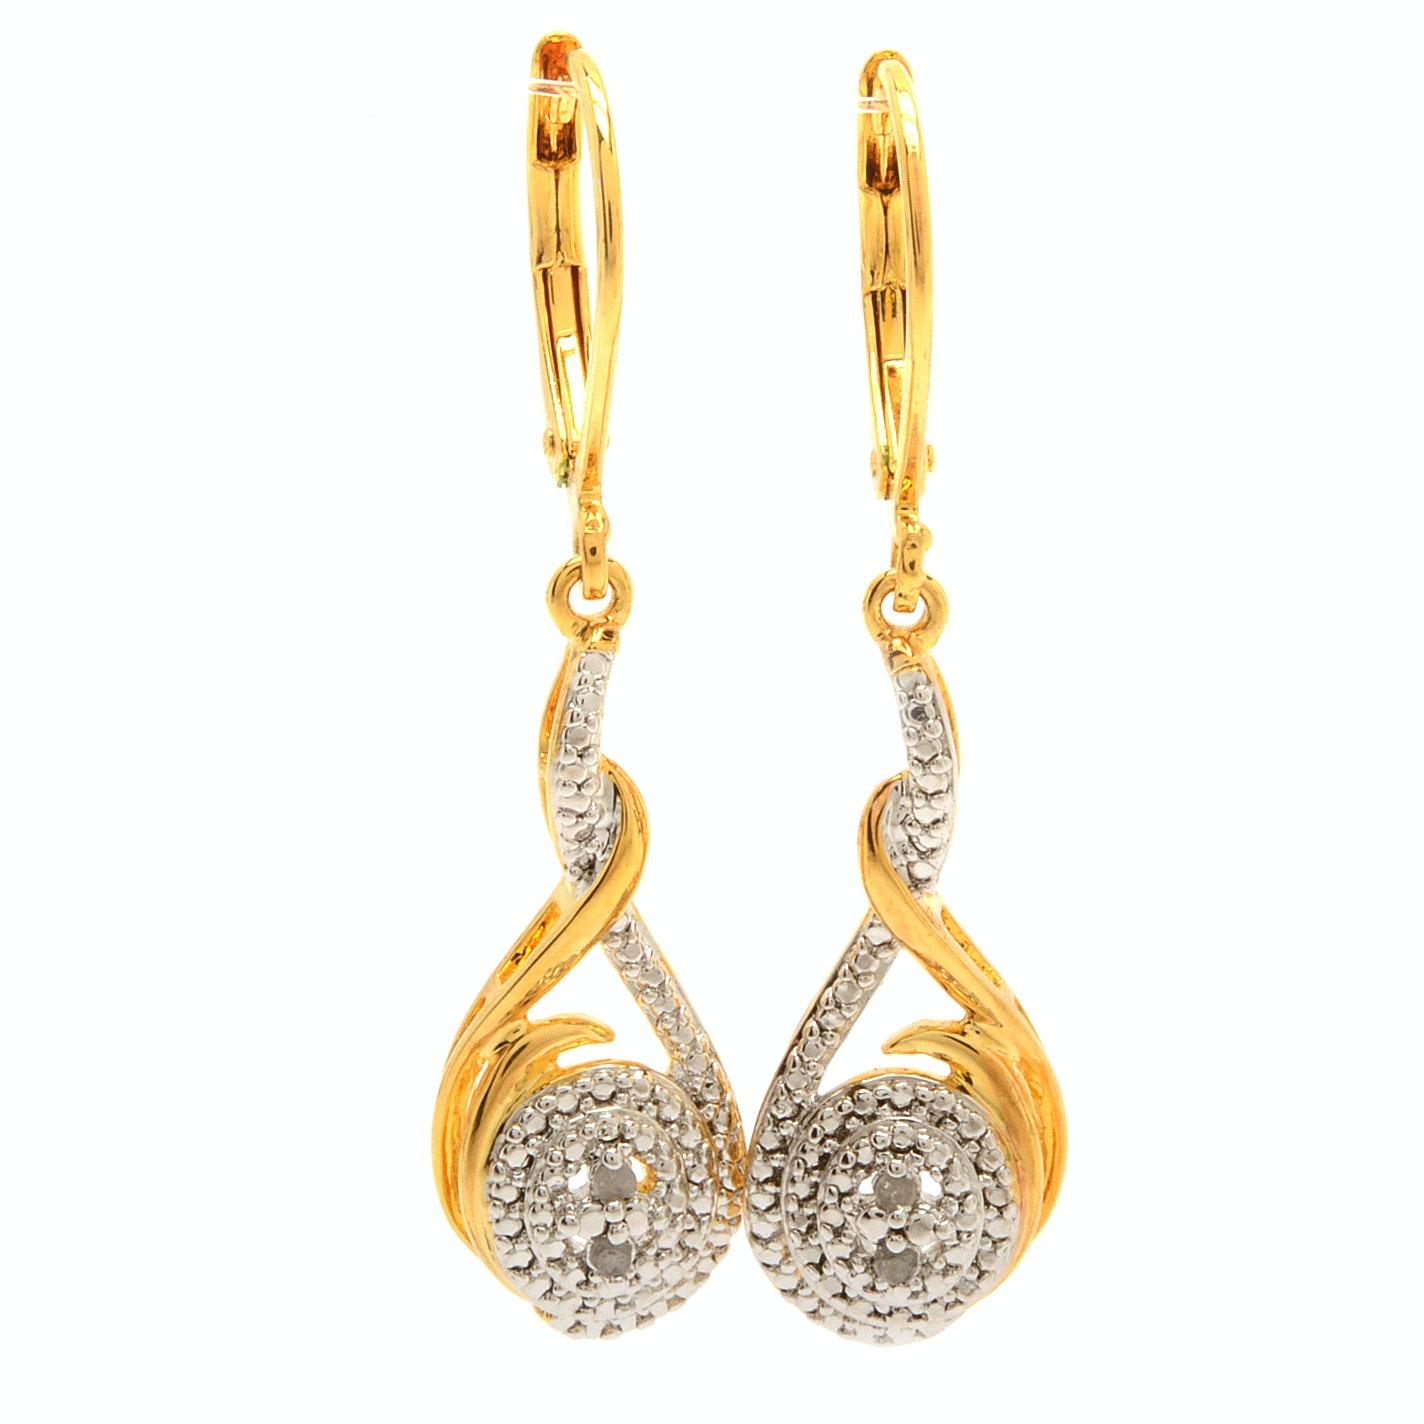 Gold Tone Diamond Fashion Earrings